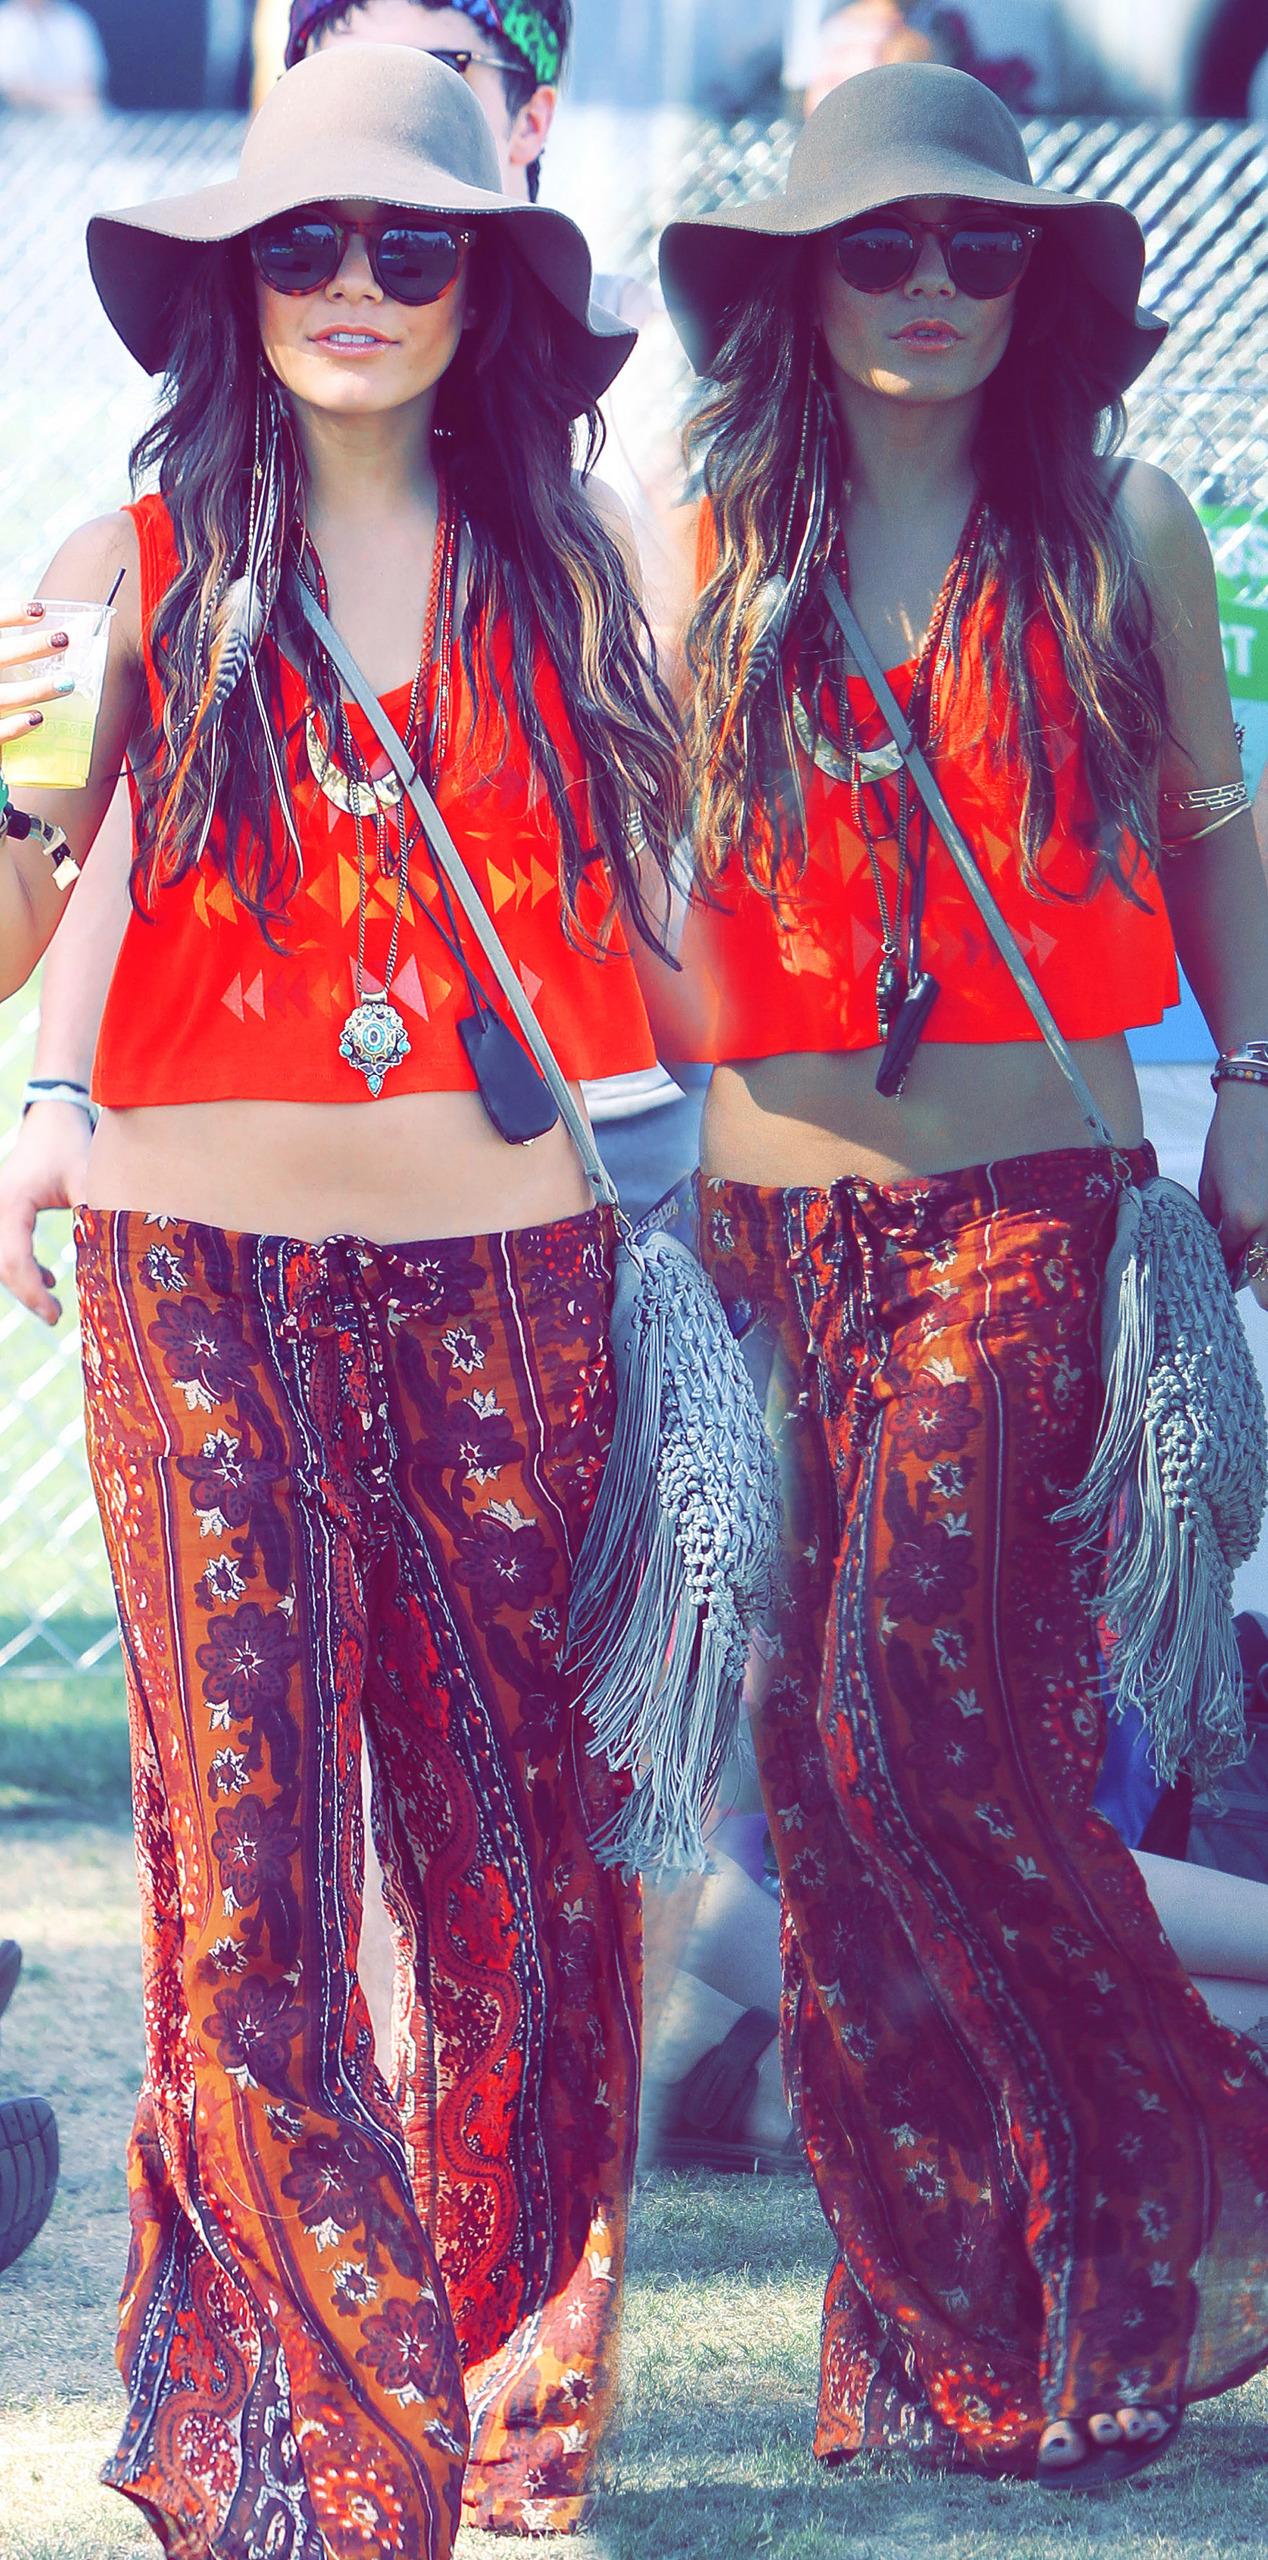 Zanessa - Zac Efron & Vanessa Hudgens Photo (2698988) - Fanpop